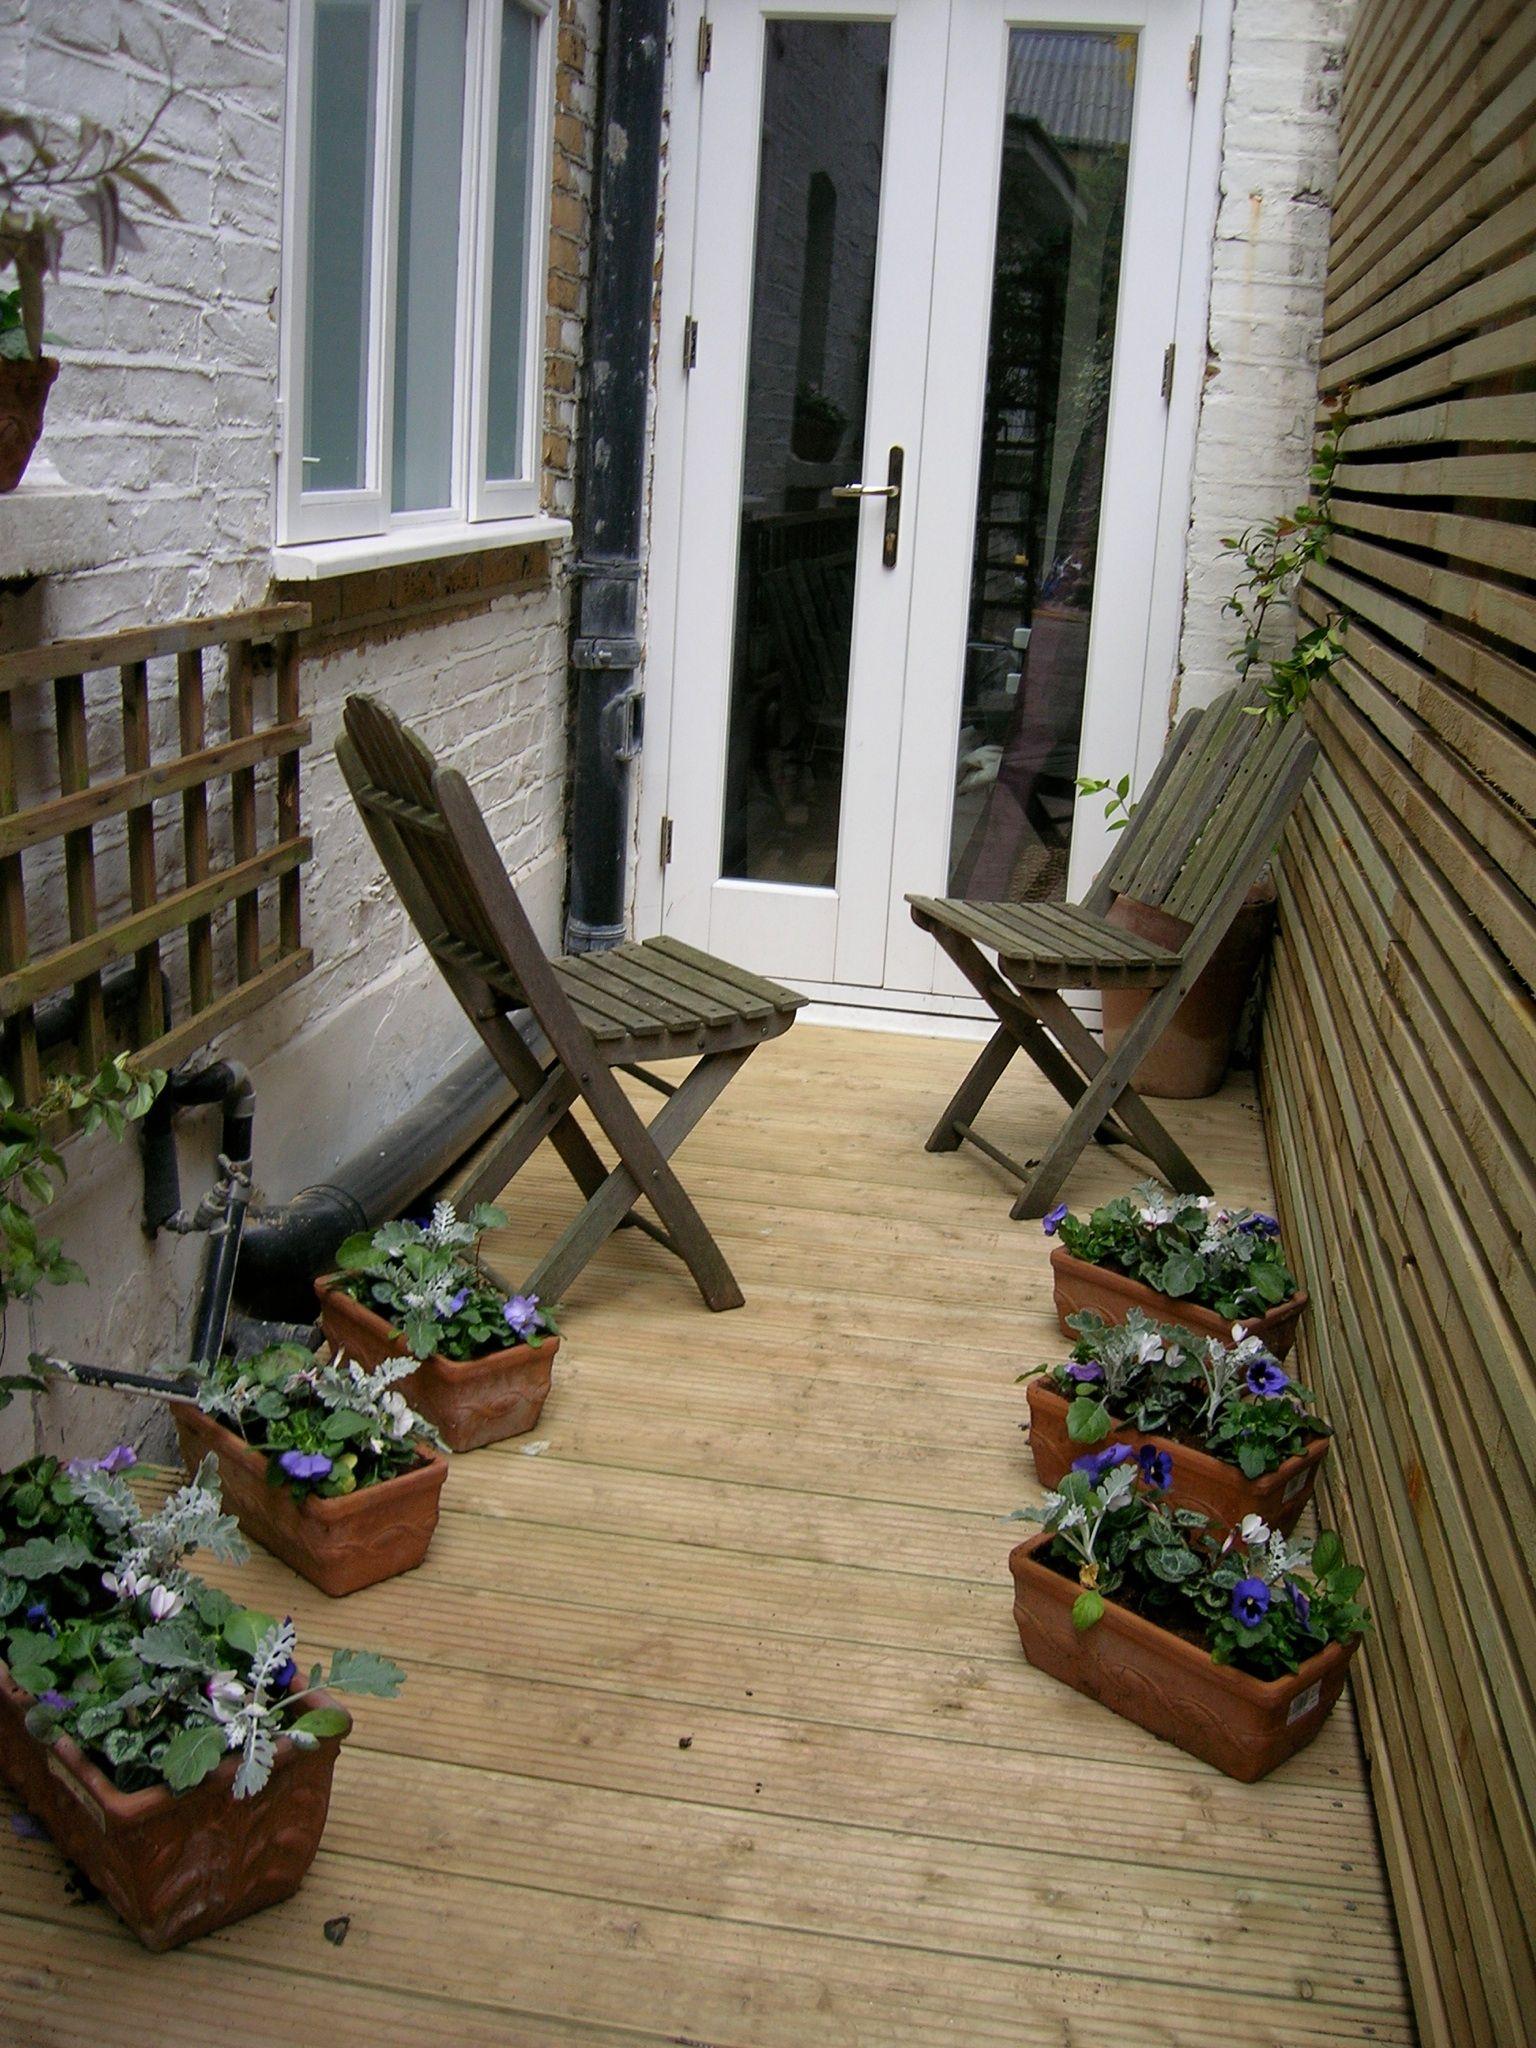 Narrow side return | Small patio garden, Narrow patio ... on Narrow Yard Ideas  id=99123